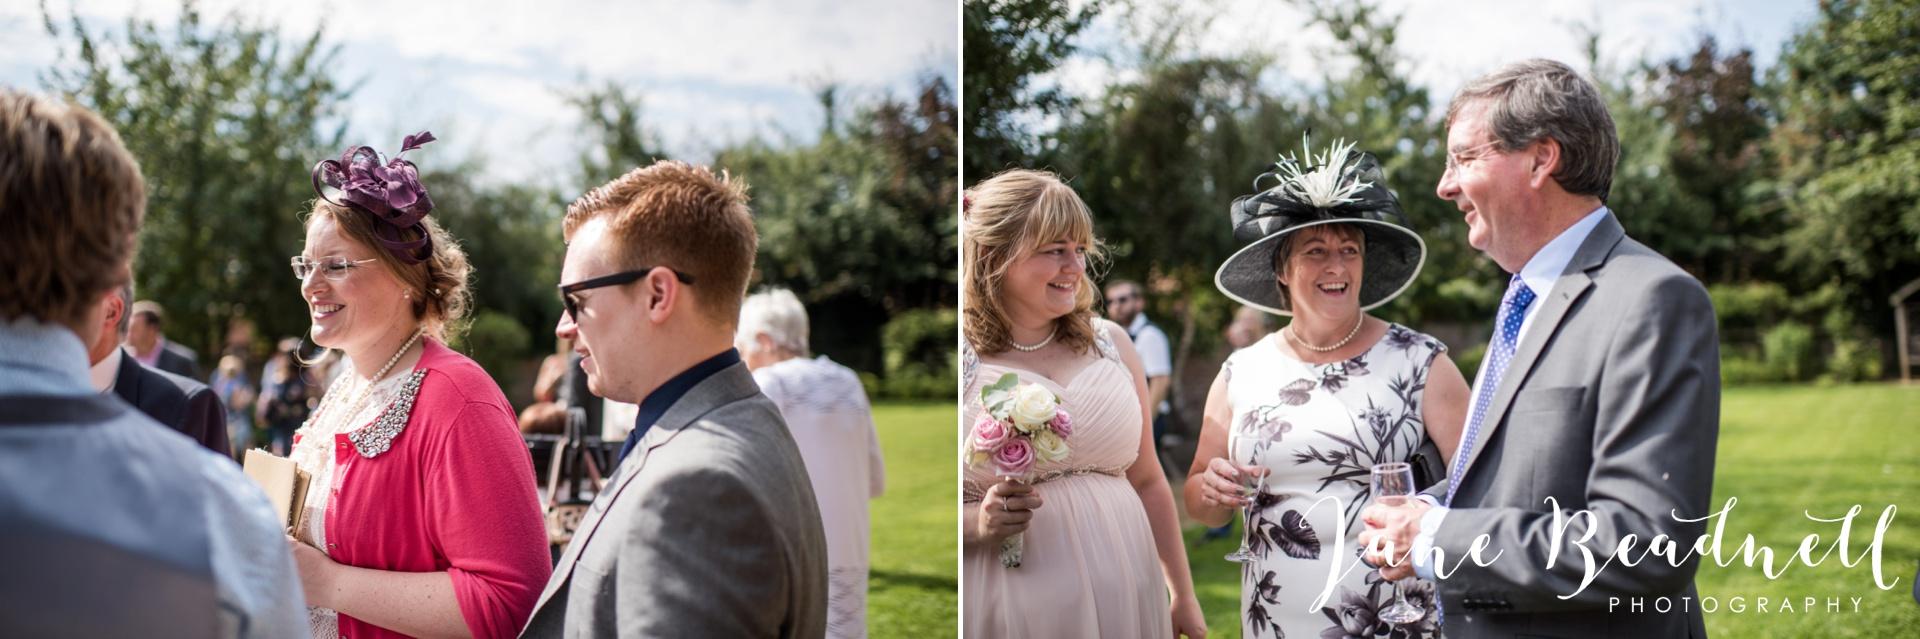 yorkshire-fine-art-wedding-photographer-jane-beadnell-photography-poppleton-york_0077